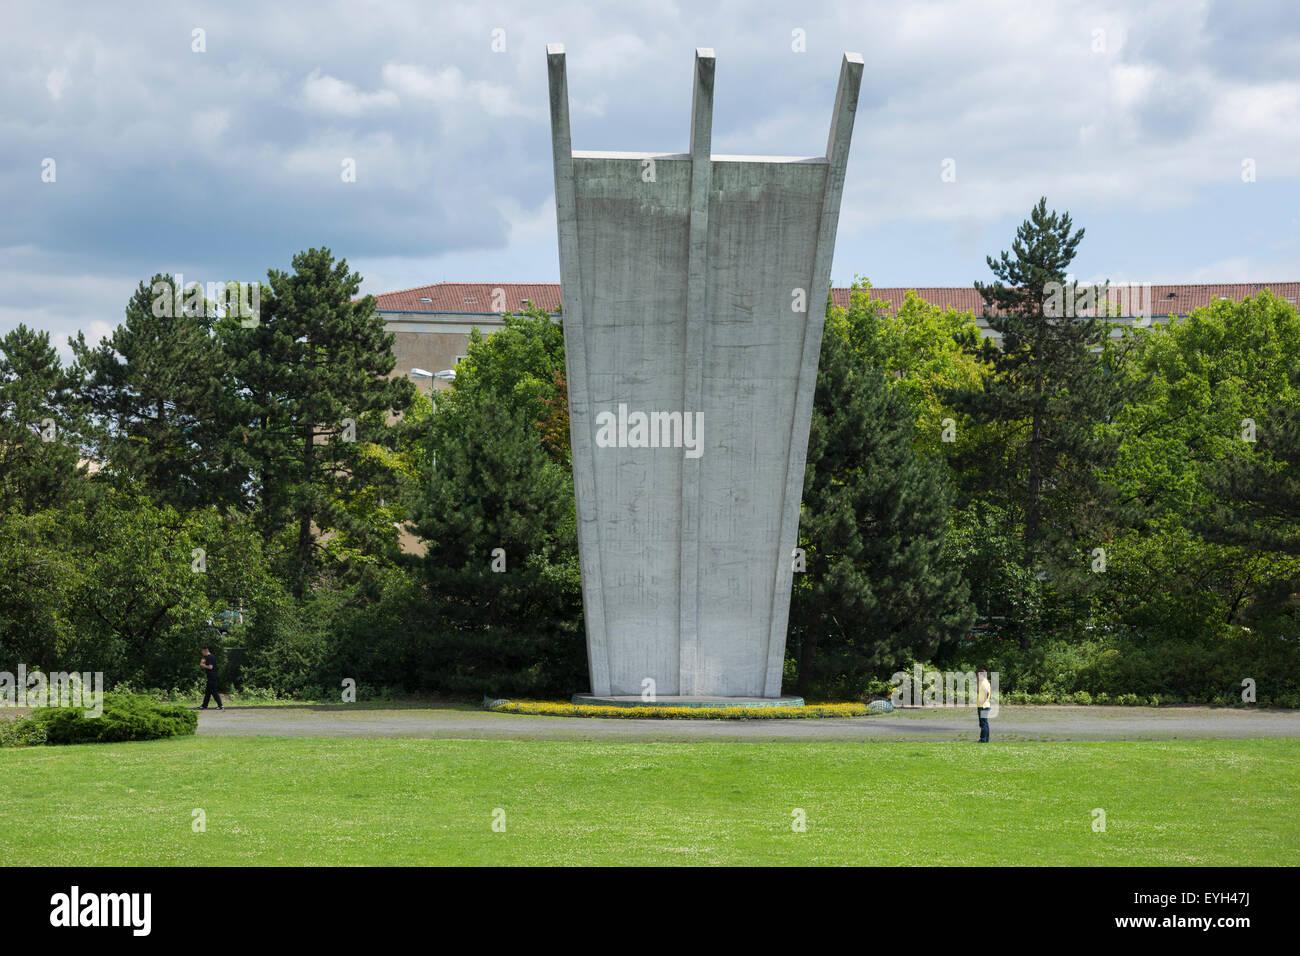 Luftbruecke monument, Berlin, Germany. - Stock Image